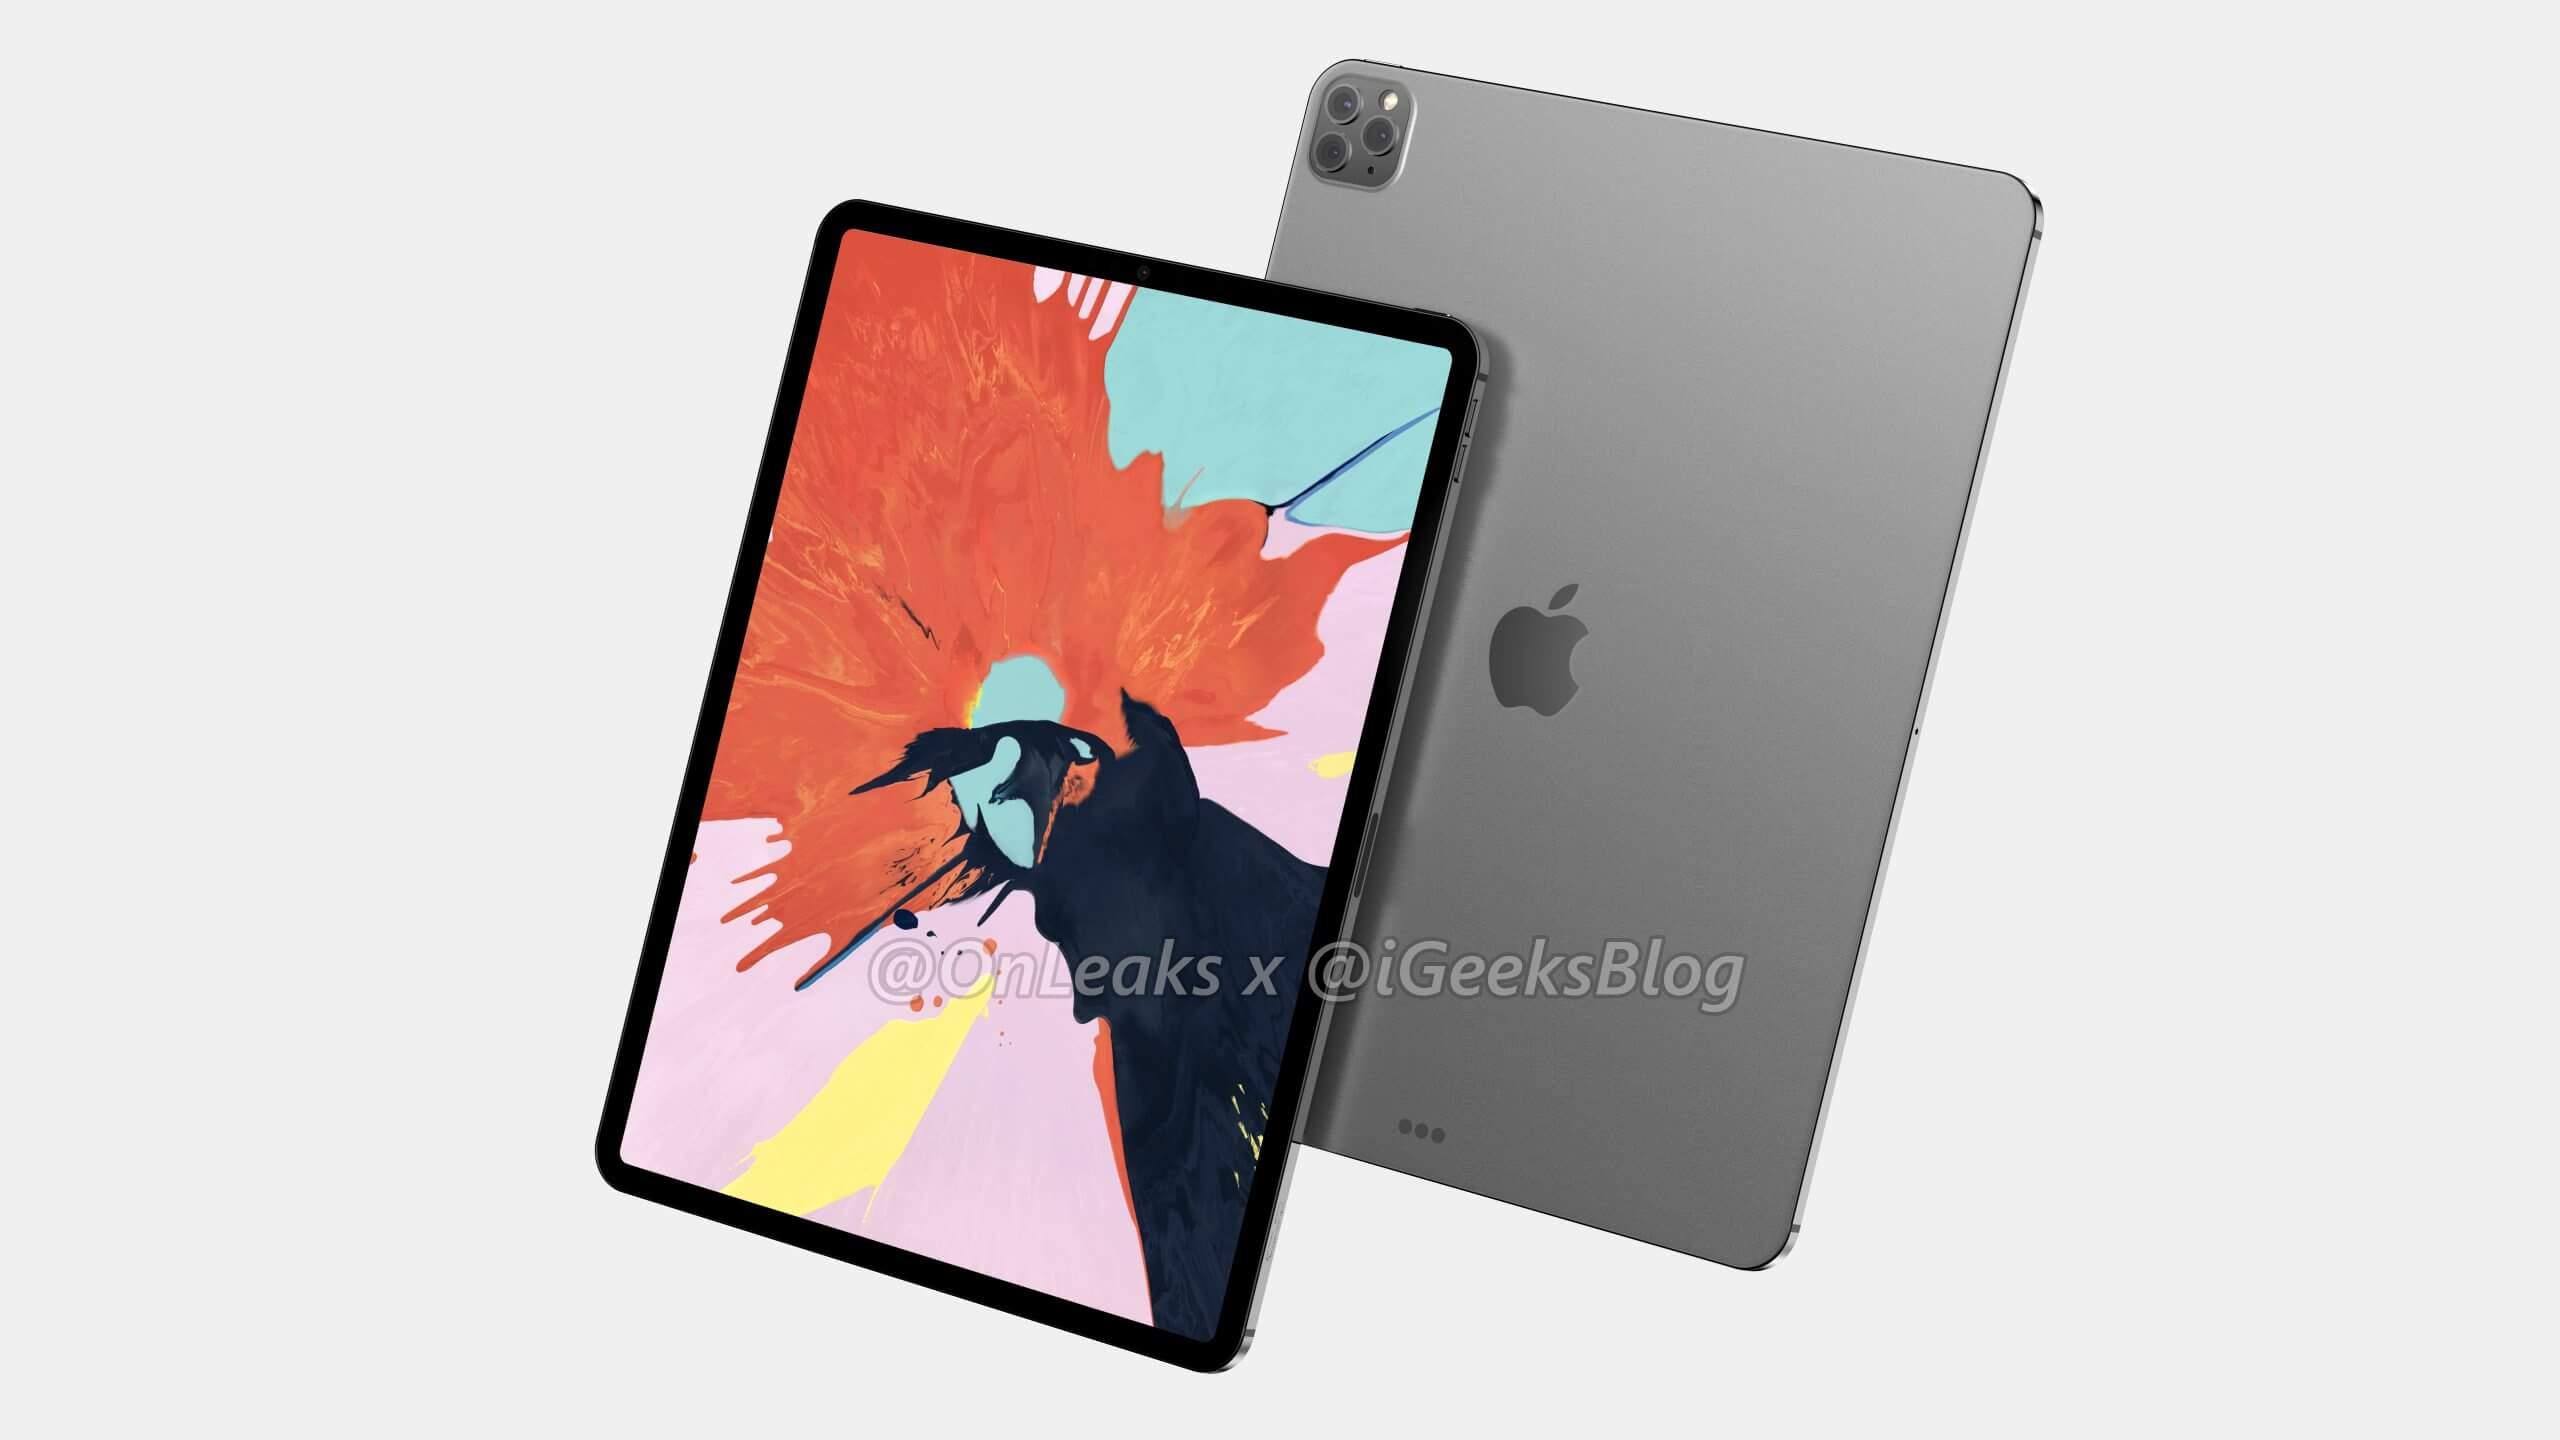 New render show 2020 12.9-inch iPad Pro